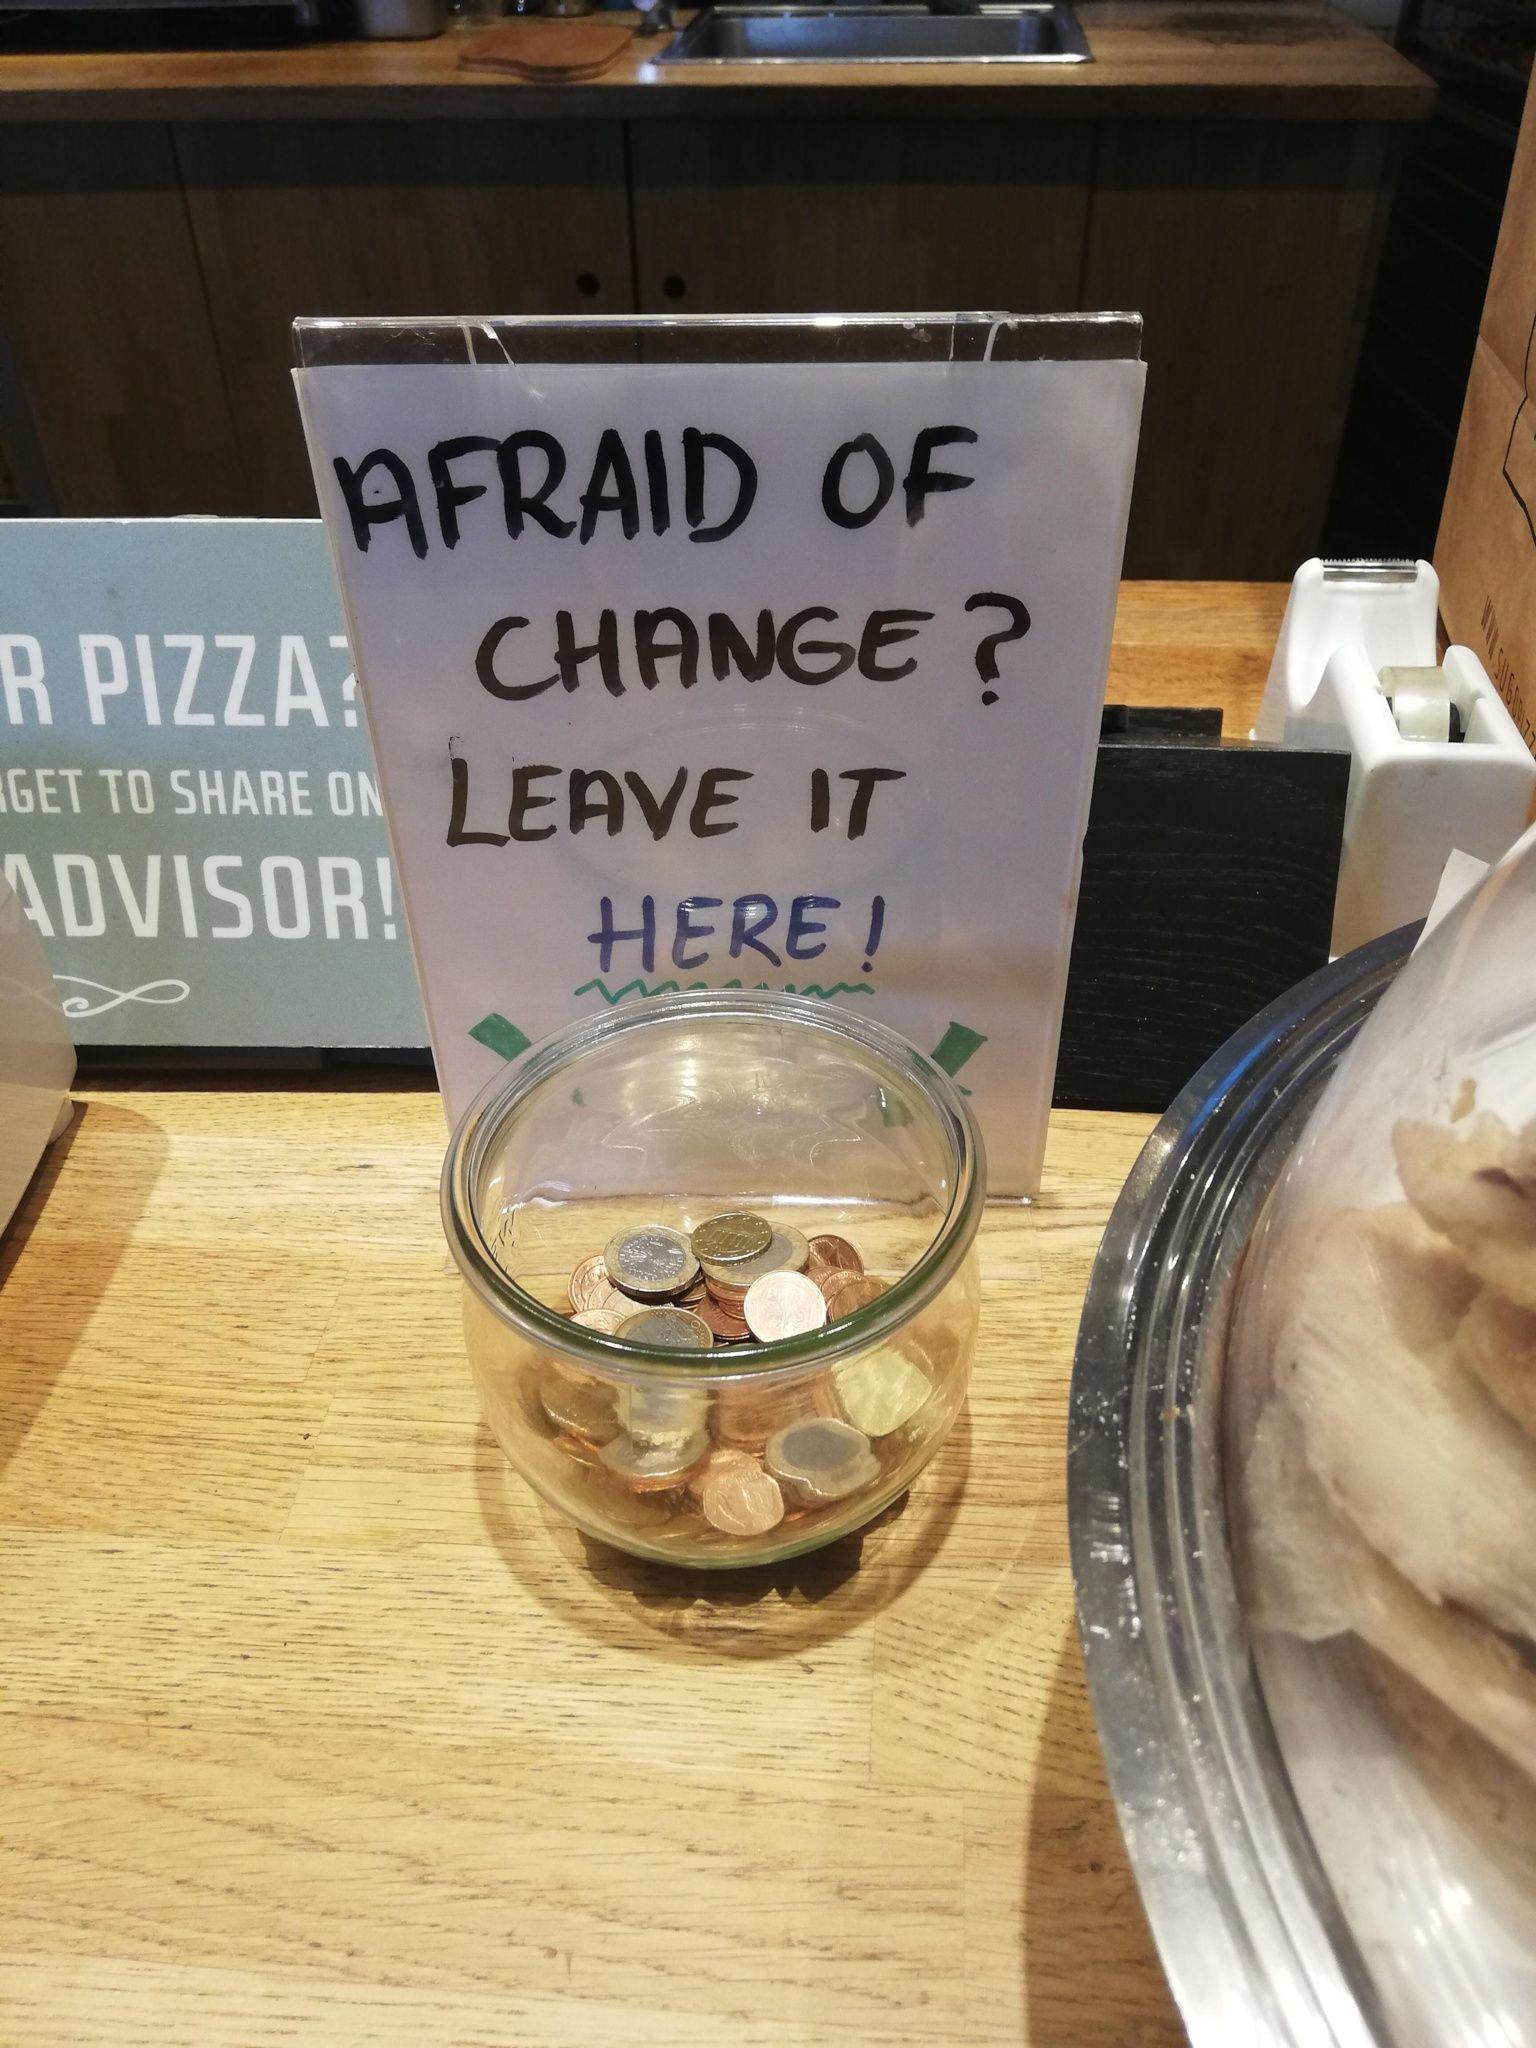 Afraid of change?